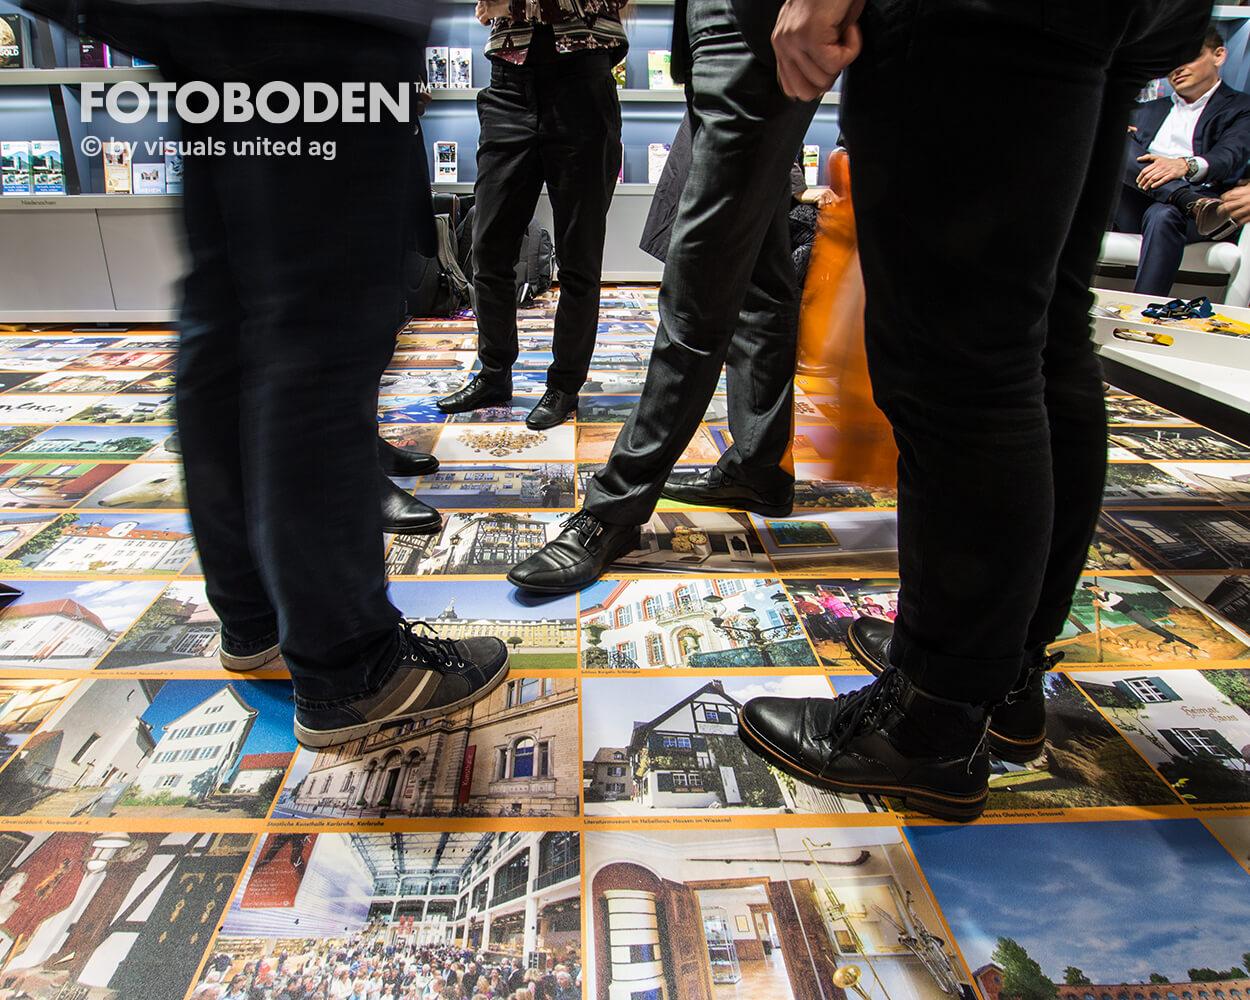 ITB6 Fotoboden Messeboden Tradeshow Flooring Bodengestaltung Messe Bodendesign Messedesign Design Boden Messegestaltung Bodenwerbung